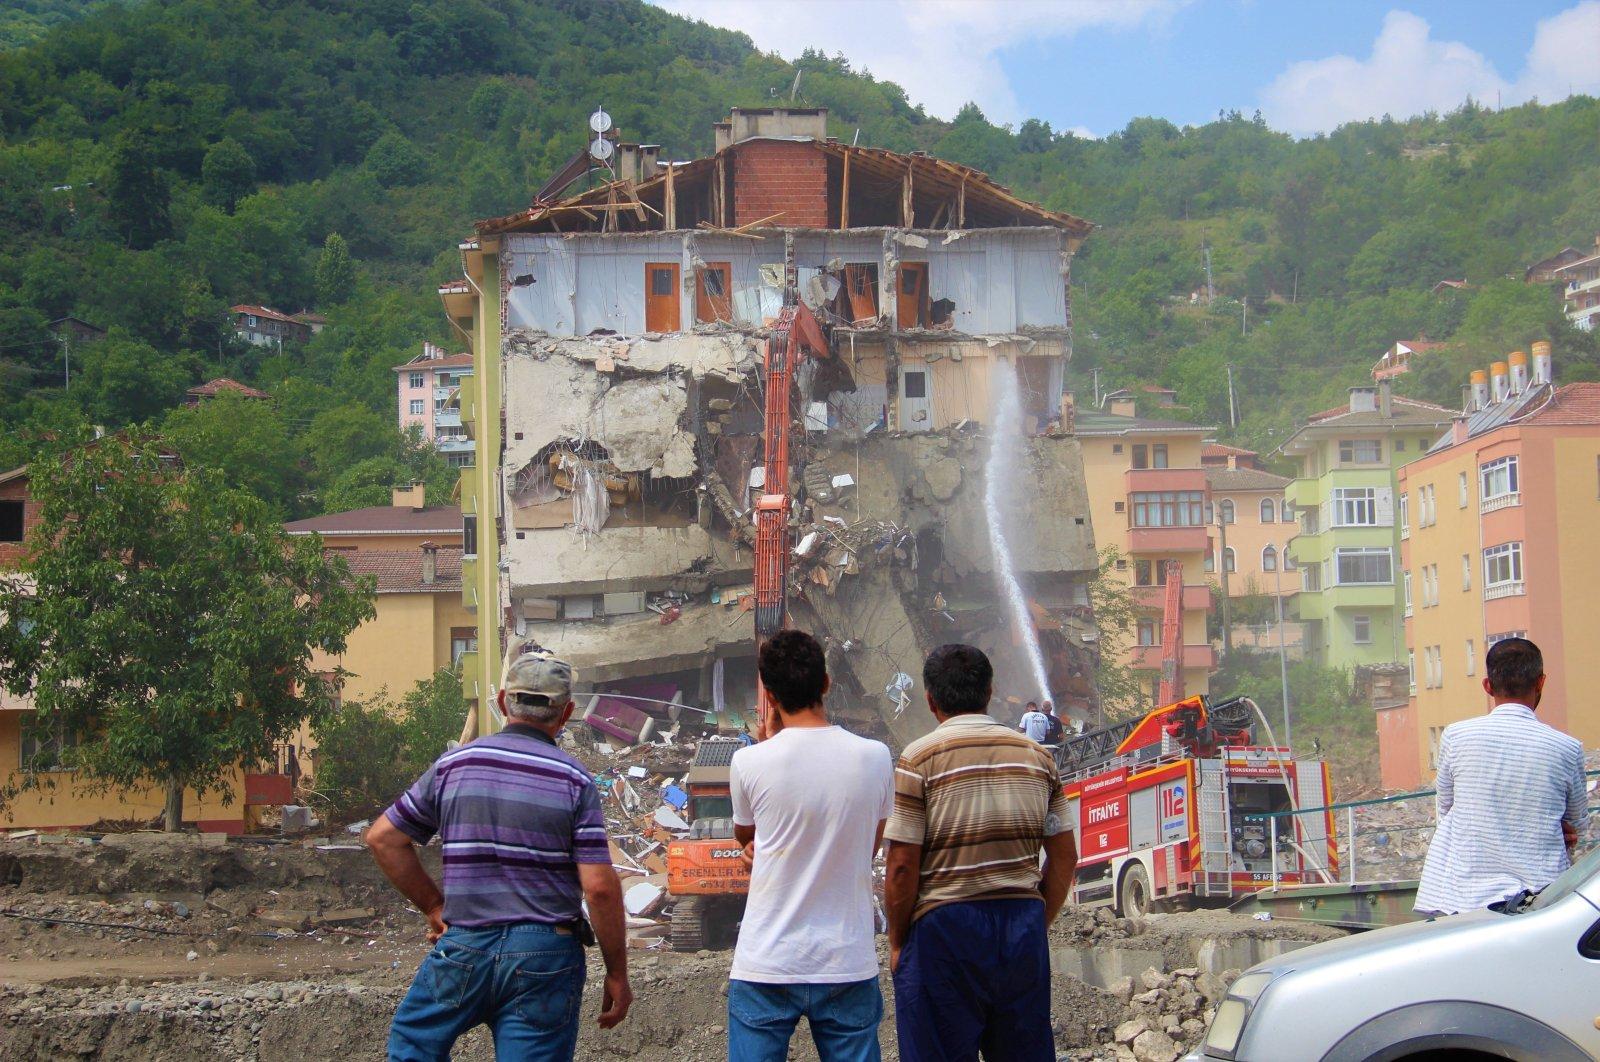 Residents watch the demolition of their building damaged in the floods, in Bozkurt, in Kastamonu, northern Turkey, Aug. 19, 2021. (IHA Photo)